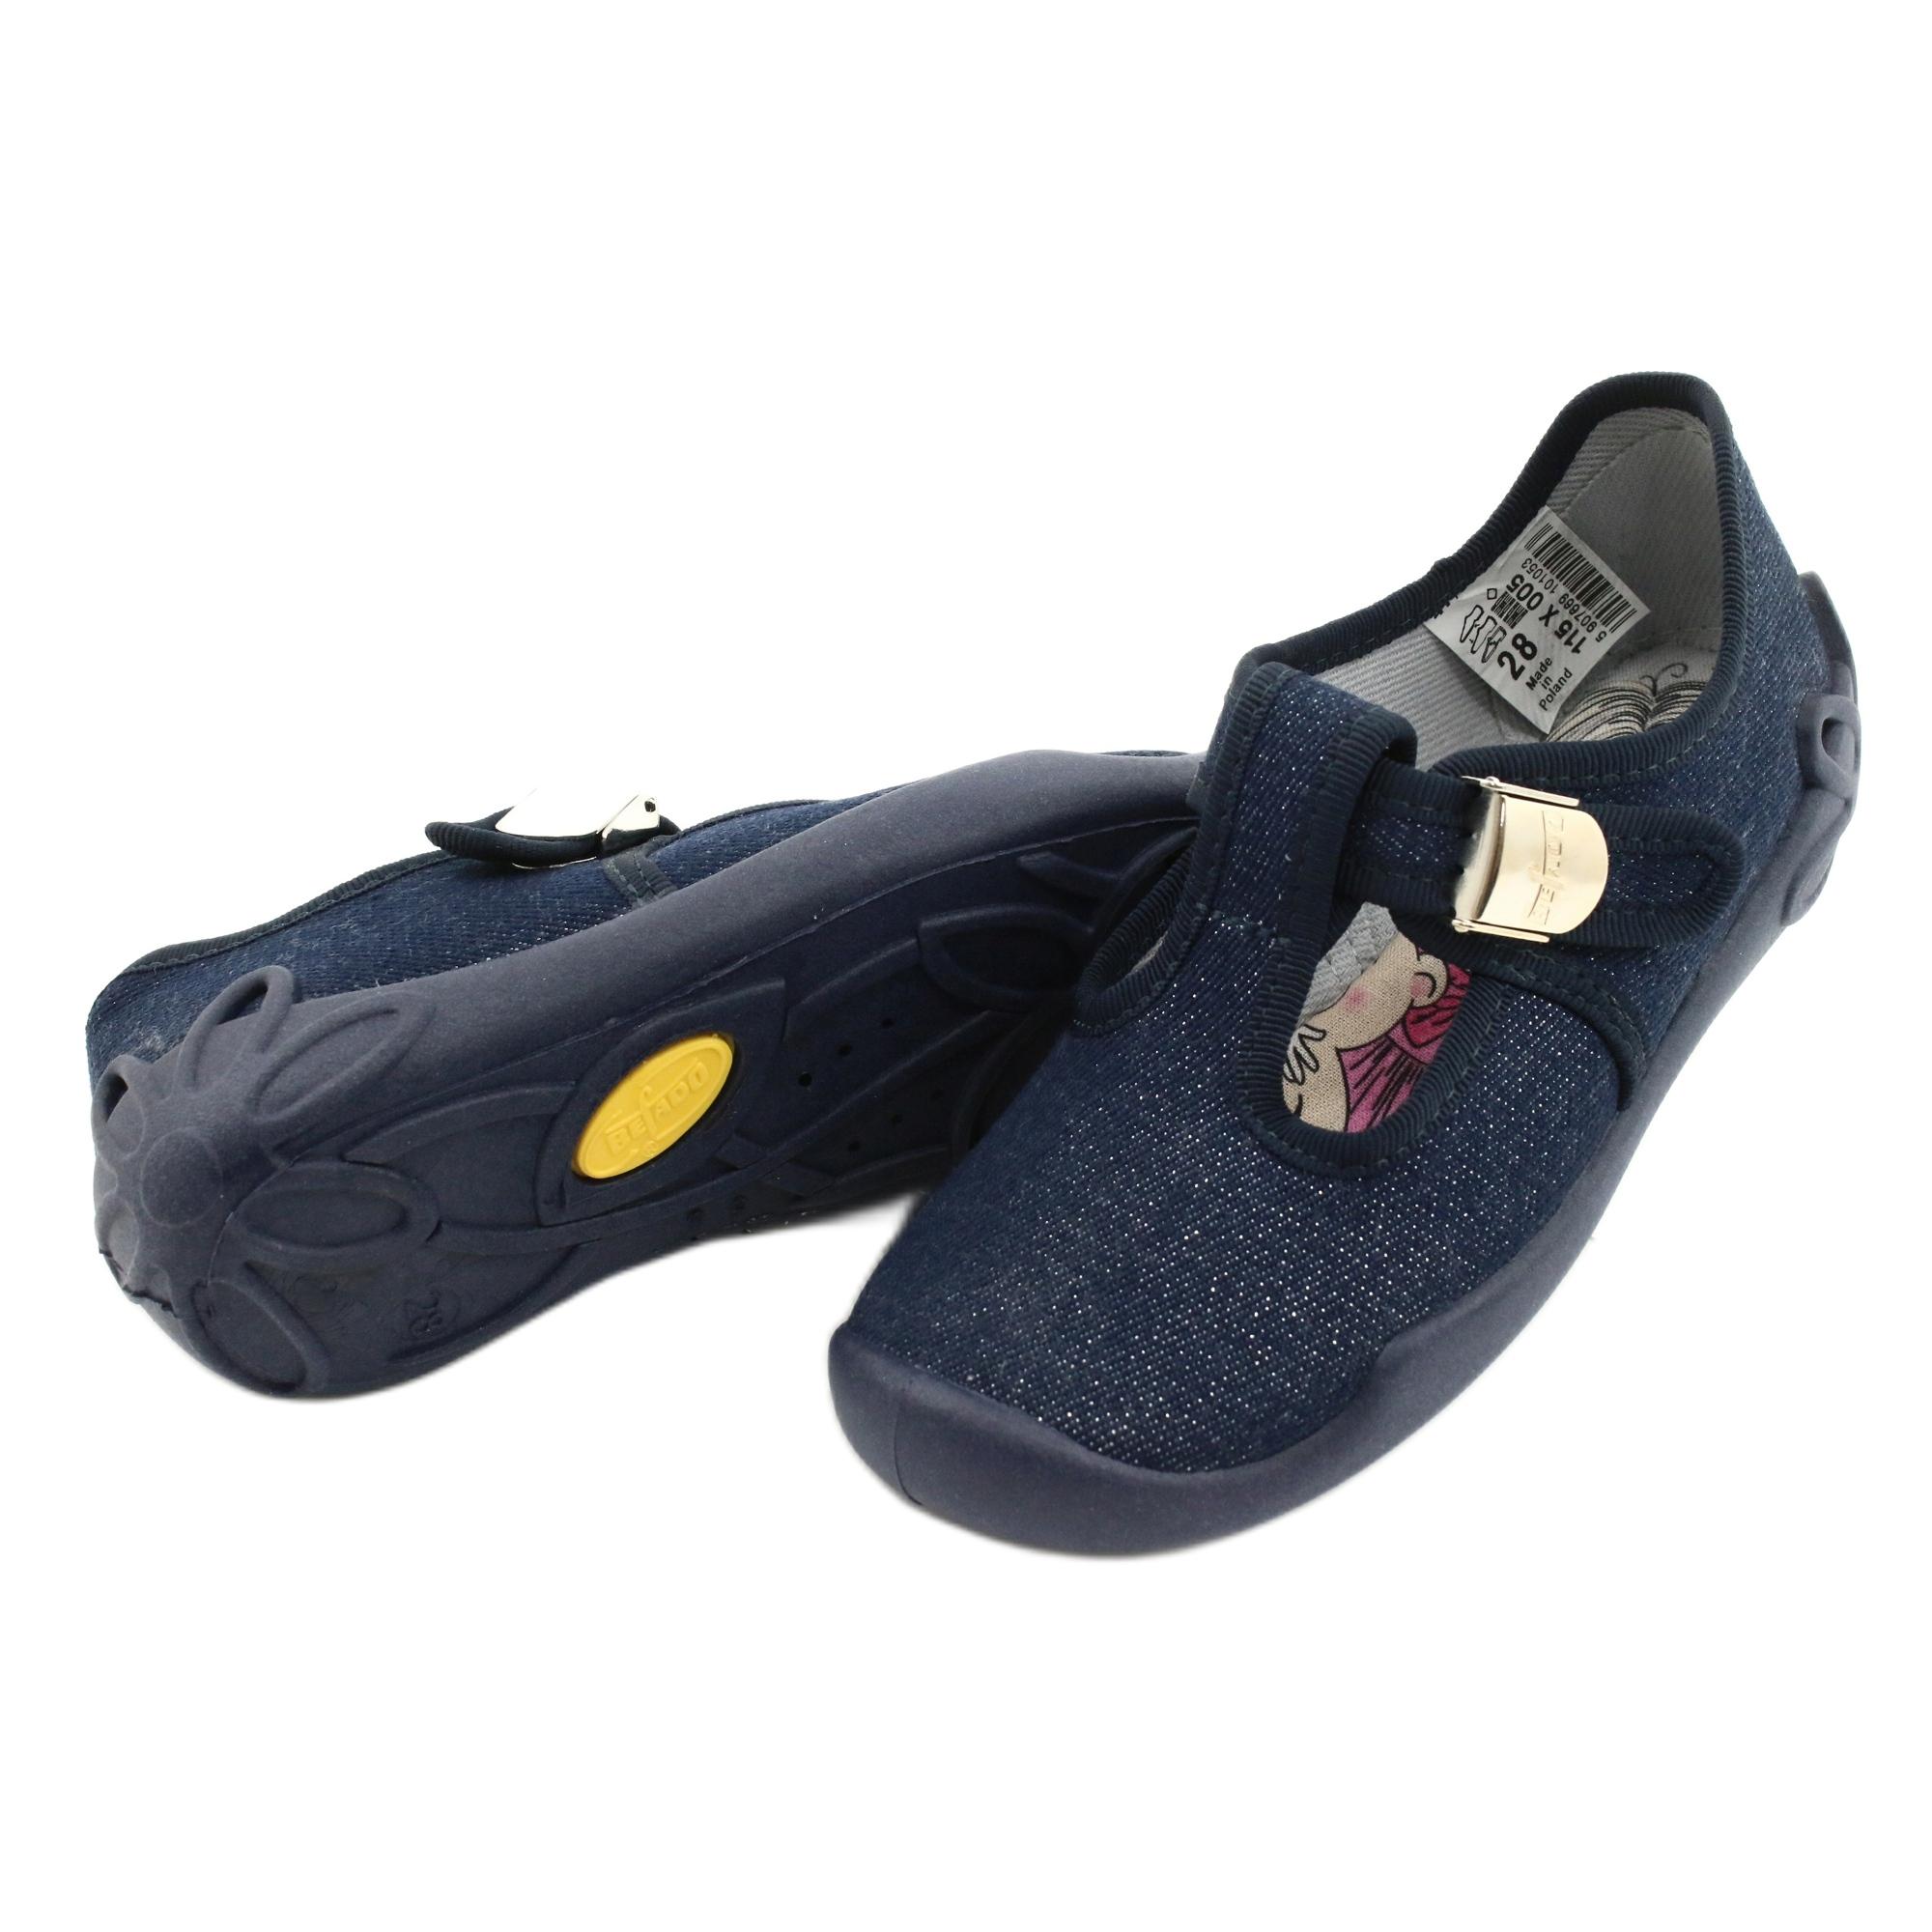 miniatura 6 - Scarpe per bambini Befado in bianco blu navy